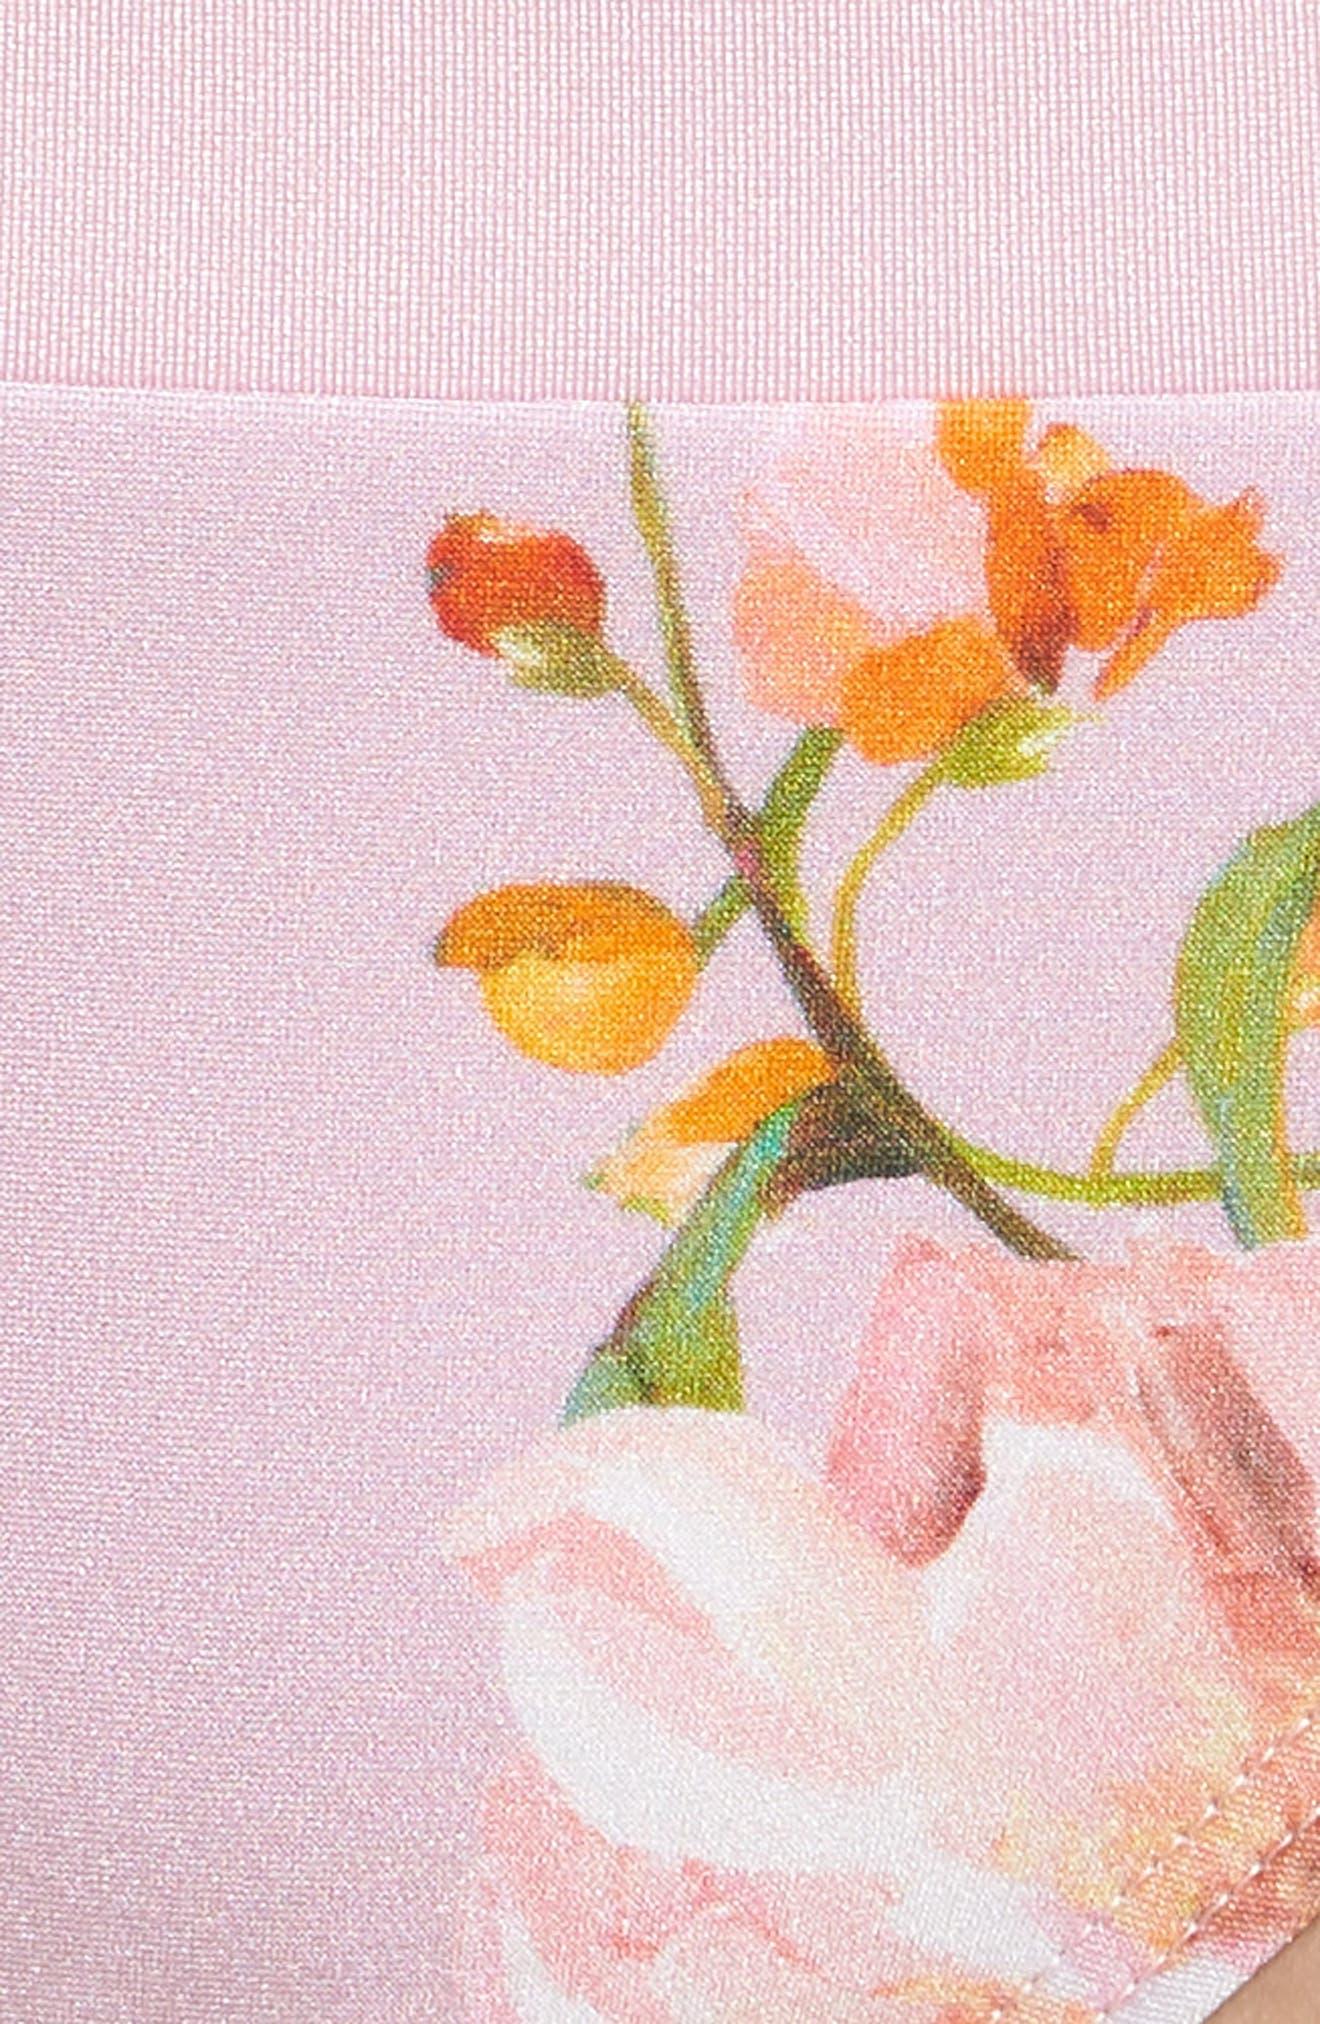 Serenity Floral Bikini Bottoms,                             Alternate thumbnail 5, color,                             PALE PINK